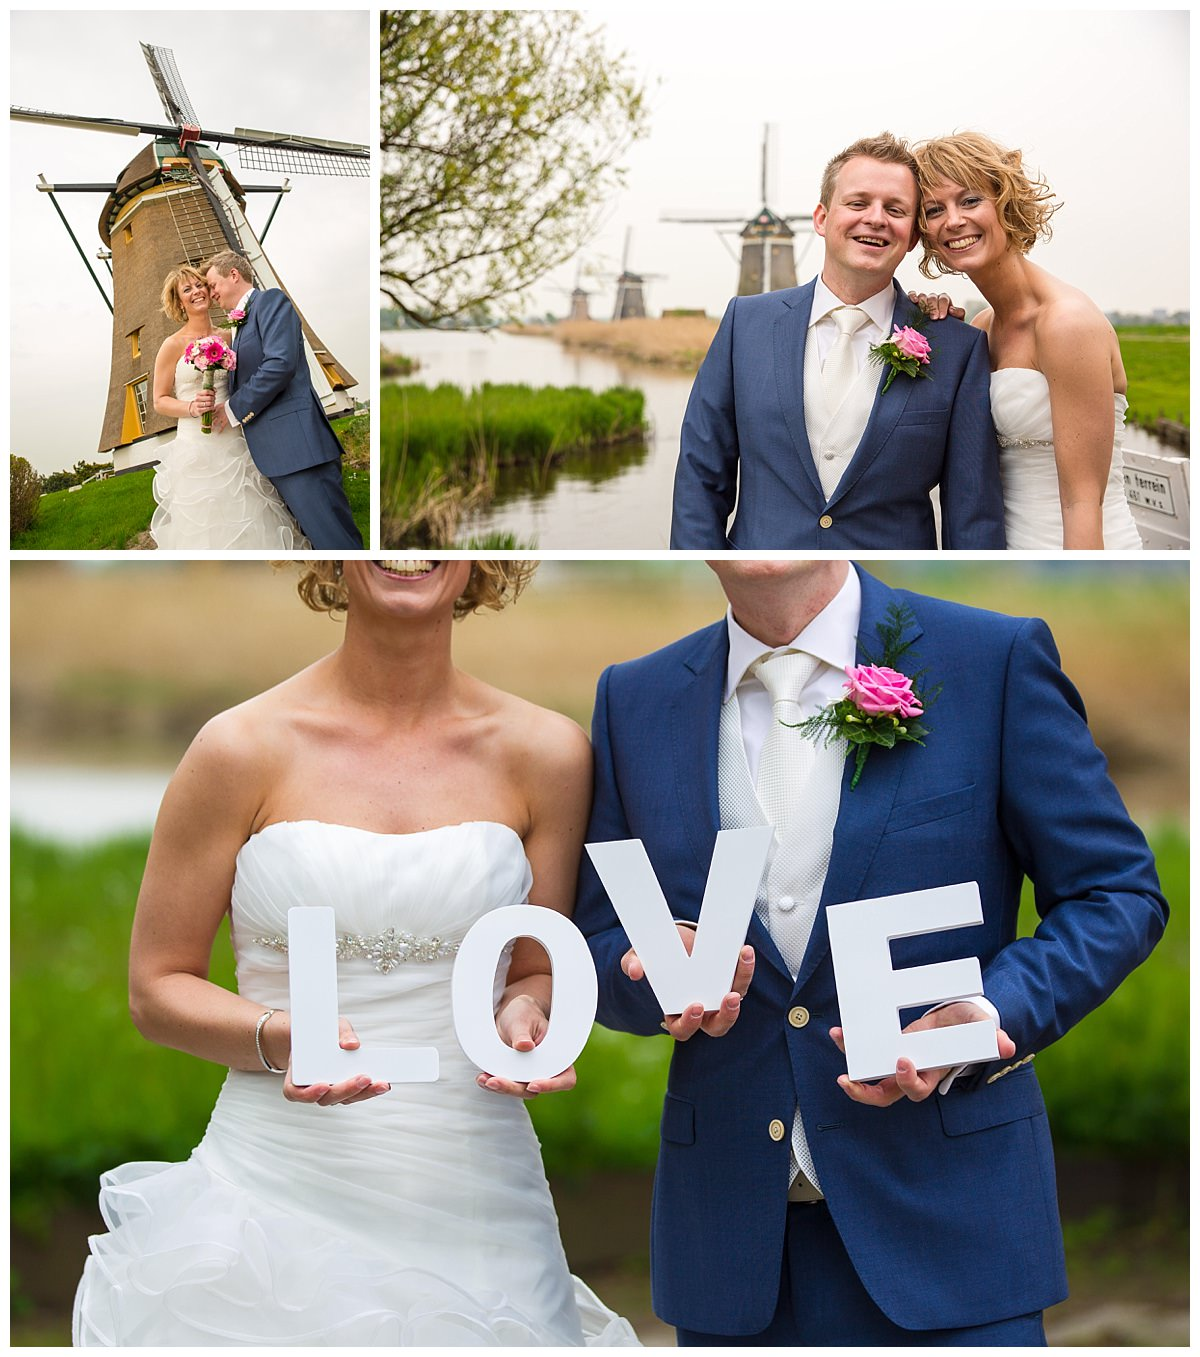 trouwshoot-bruidsfotografie-trouwfoto-feestfotografie-marcel en desiree-286.jpg